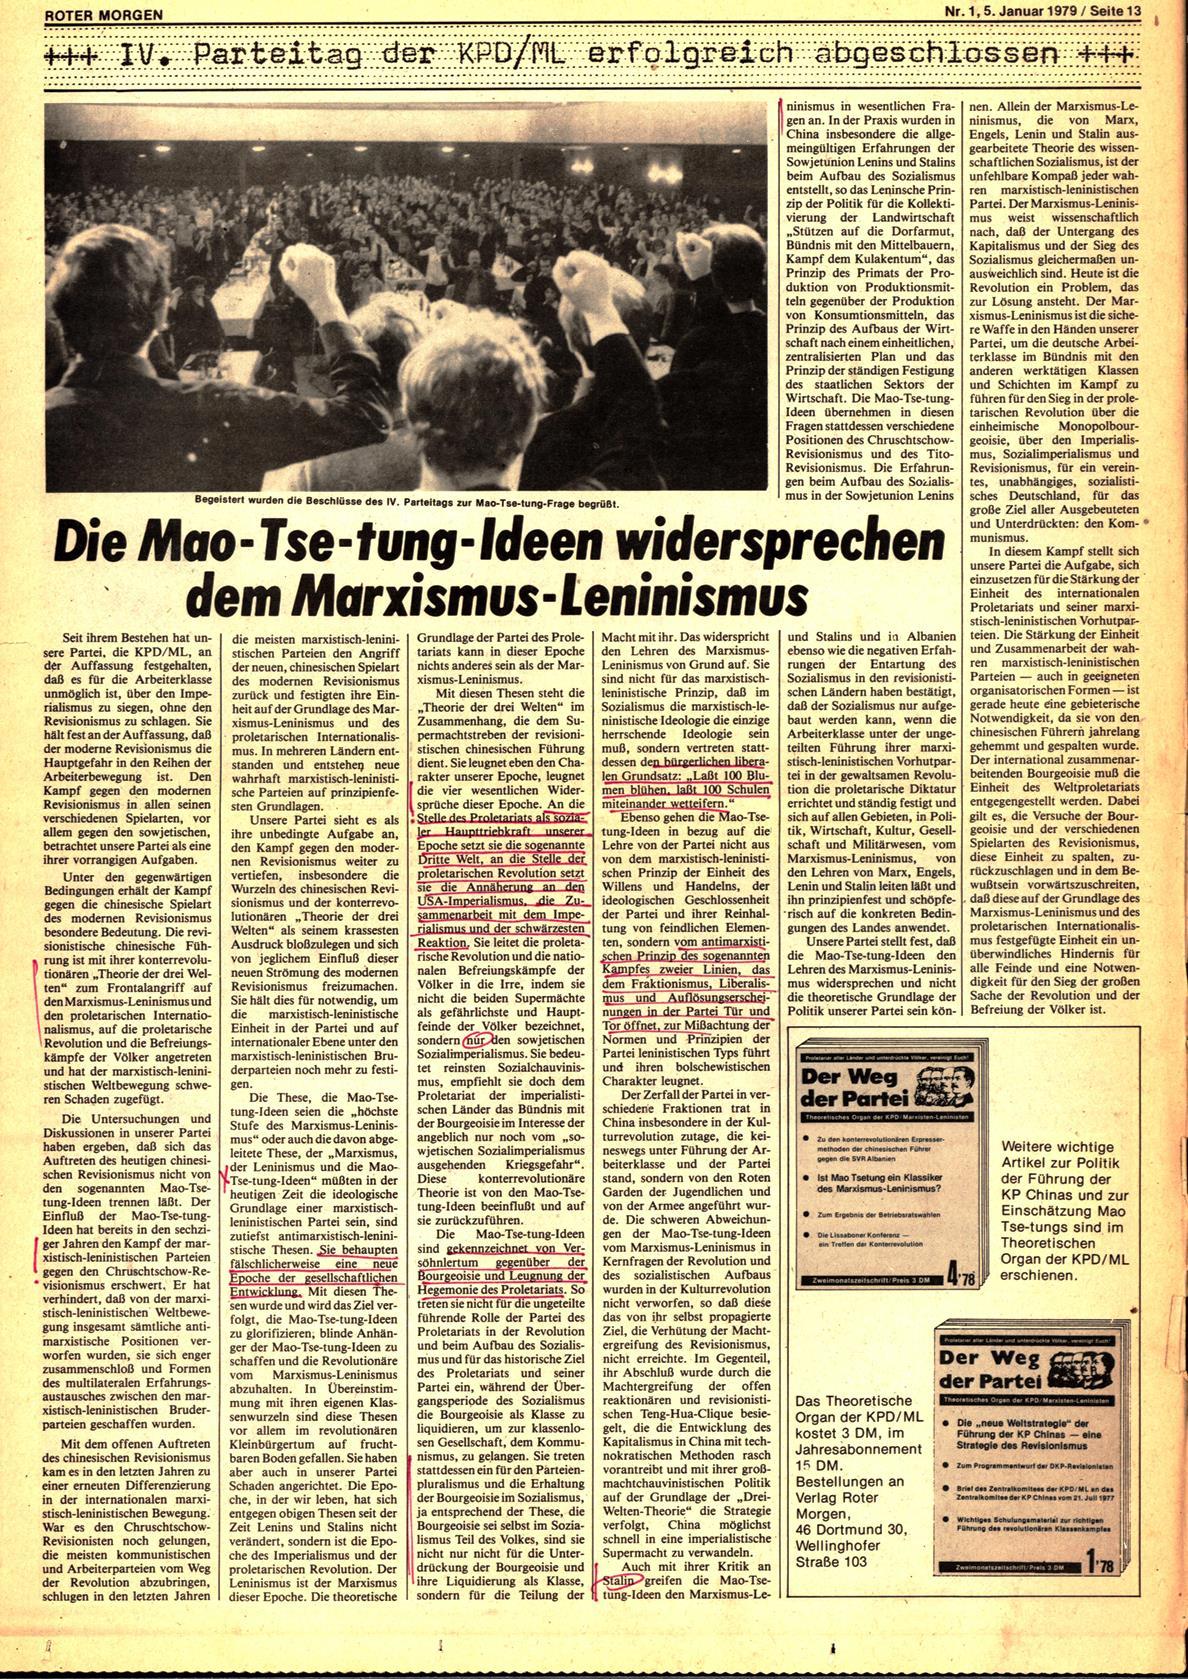 Roter Morgen, 13. Jg., 5. Januar 1979, Nr. 1, Seite 13